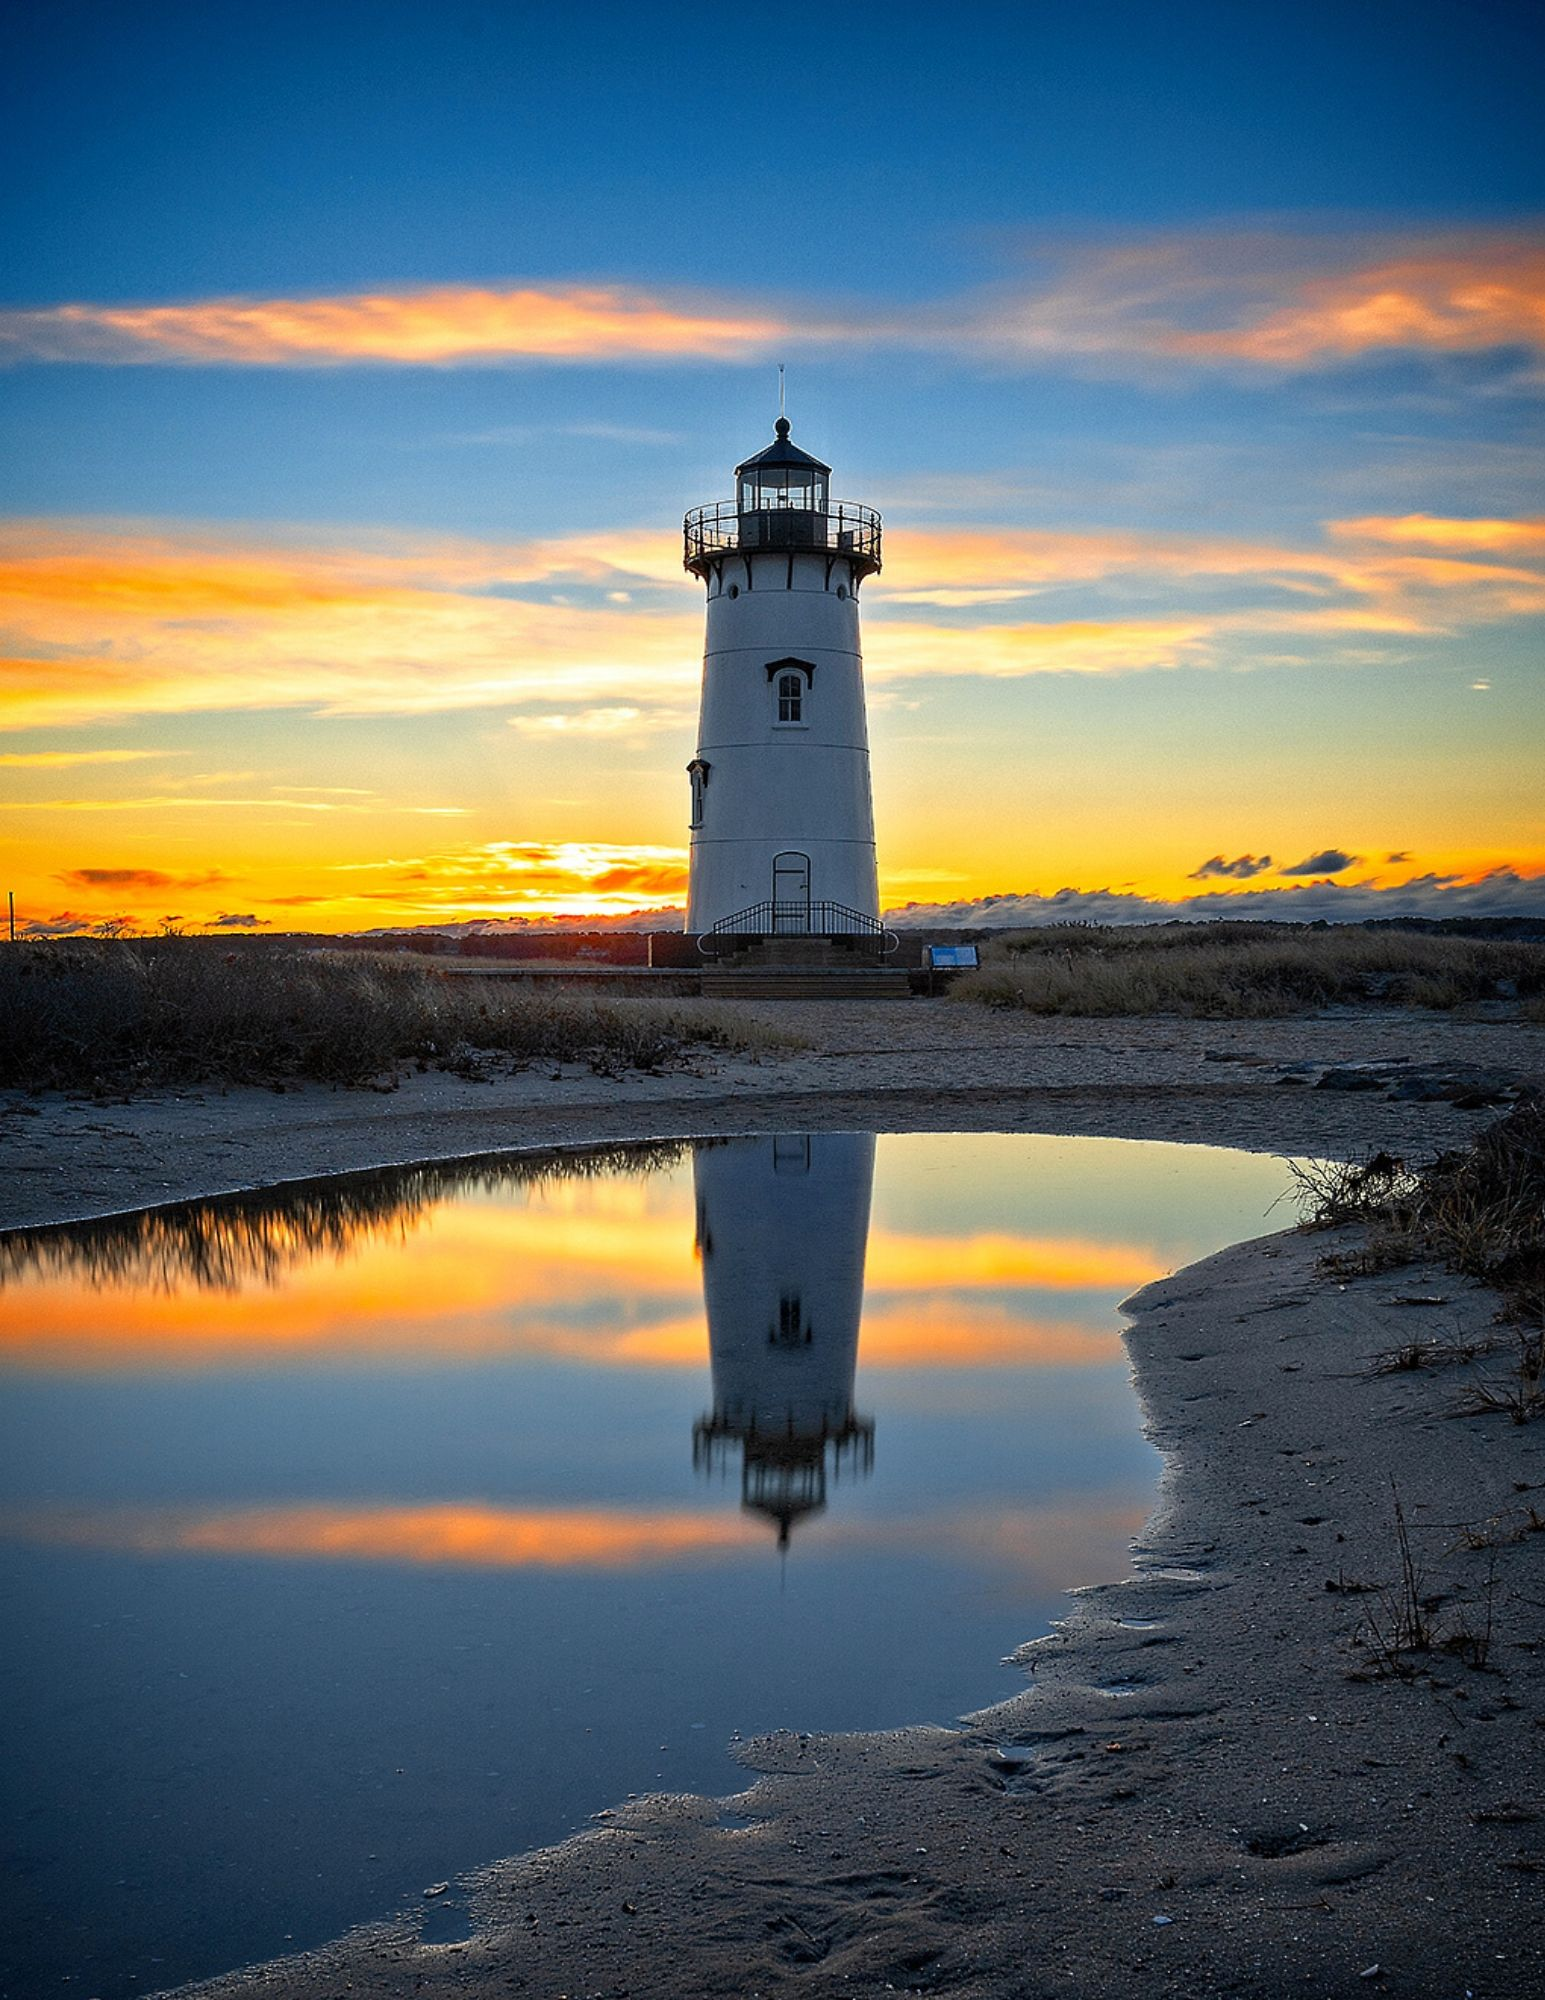 John Montes Jr Photography Best Places to Photograph Sunrise and Sunset on Marthas Vineyard-Best Places to Photograph Sunrise and Sunset on Marthas Vineyard-22